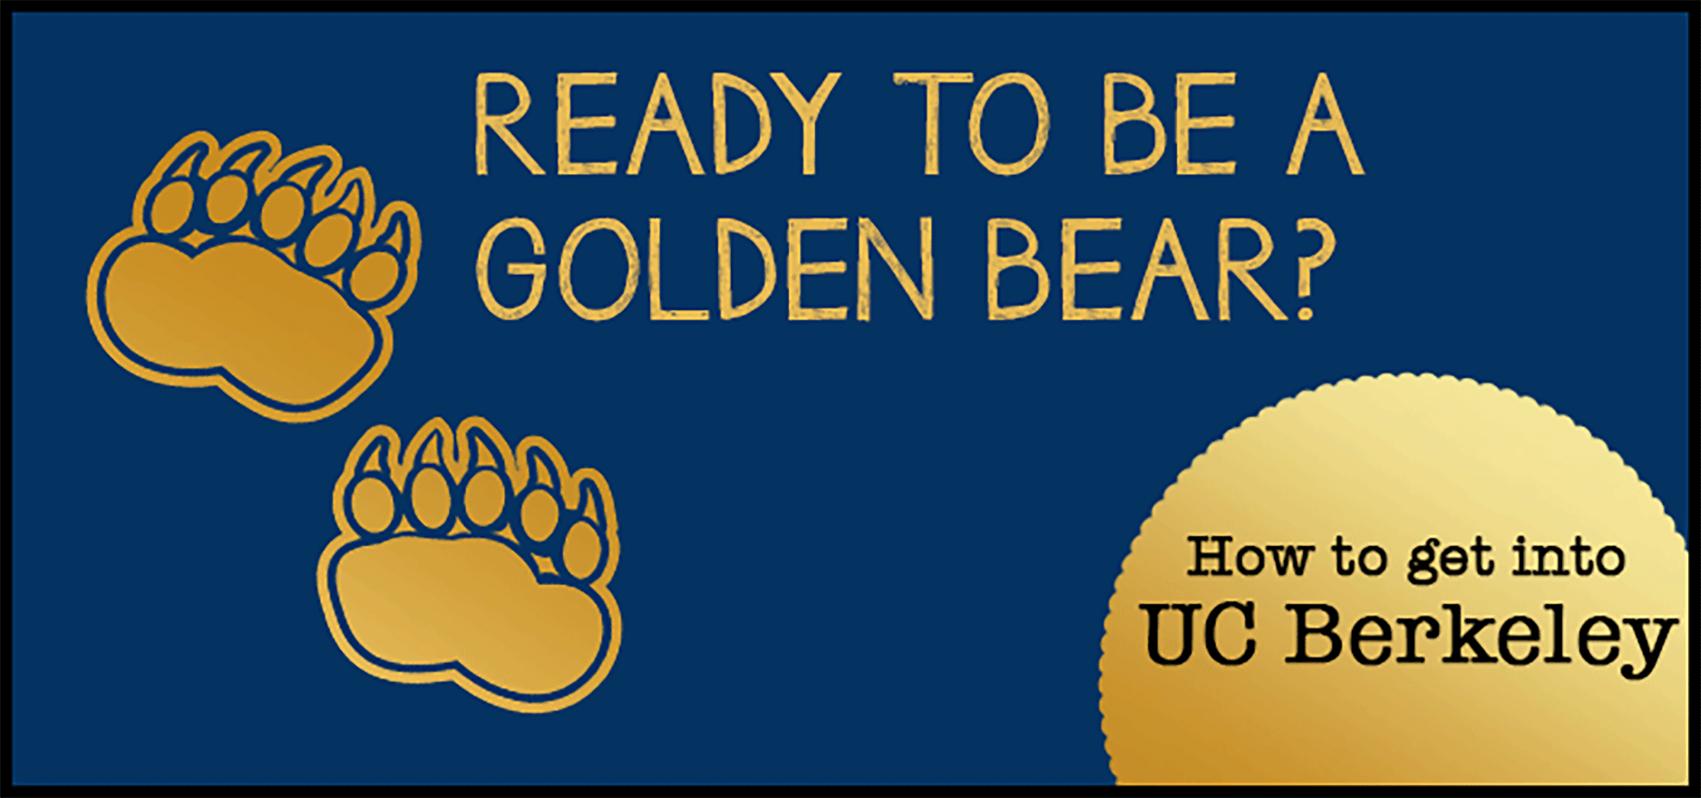 How To Get In: Uc Berkeley Admissions Requirements with Uc Berkeley Academic Schedule